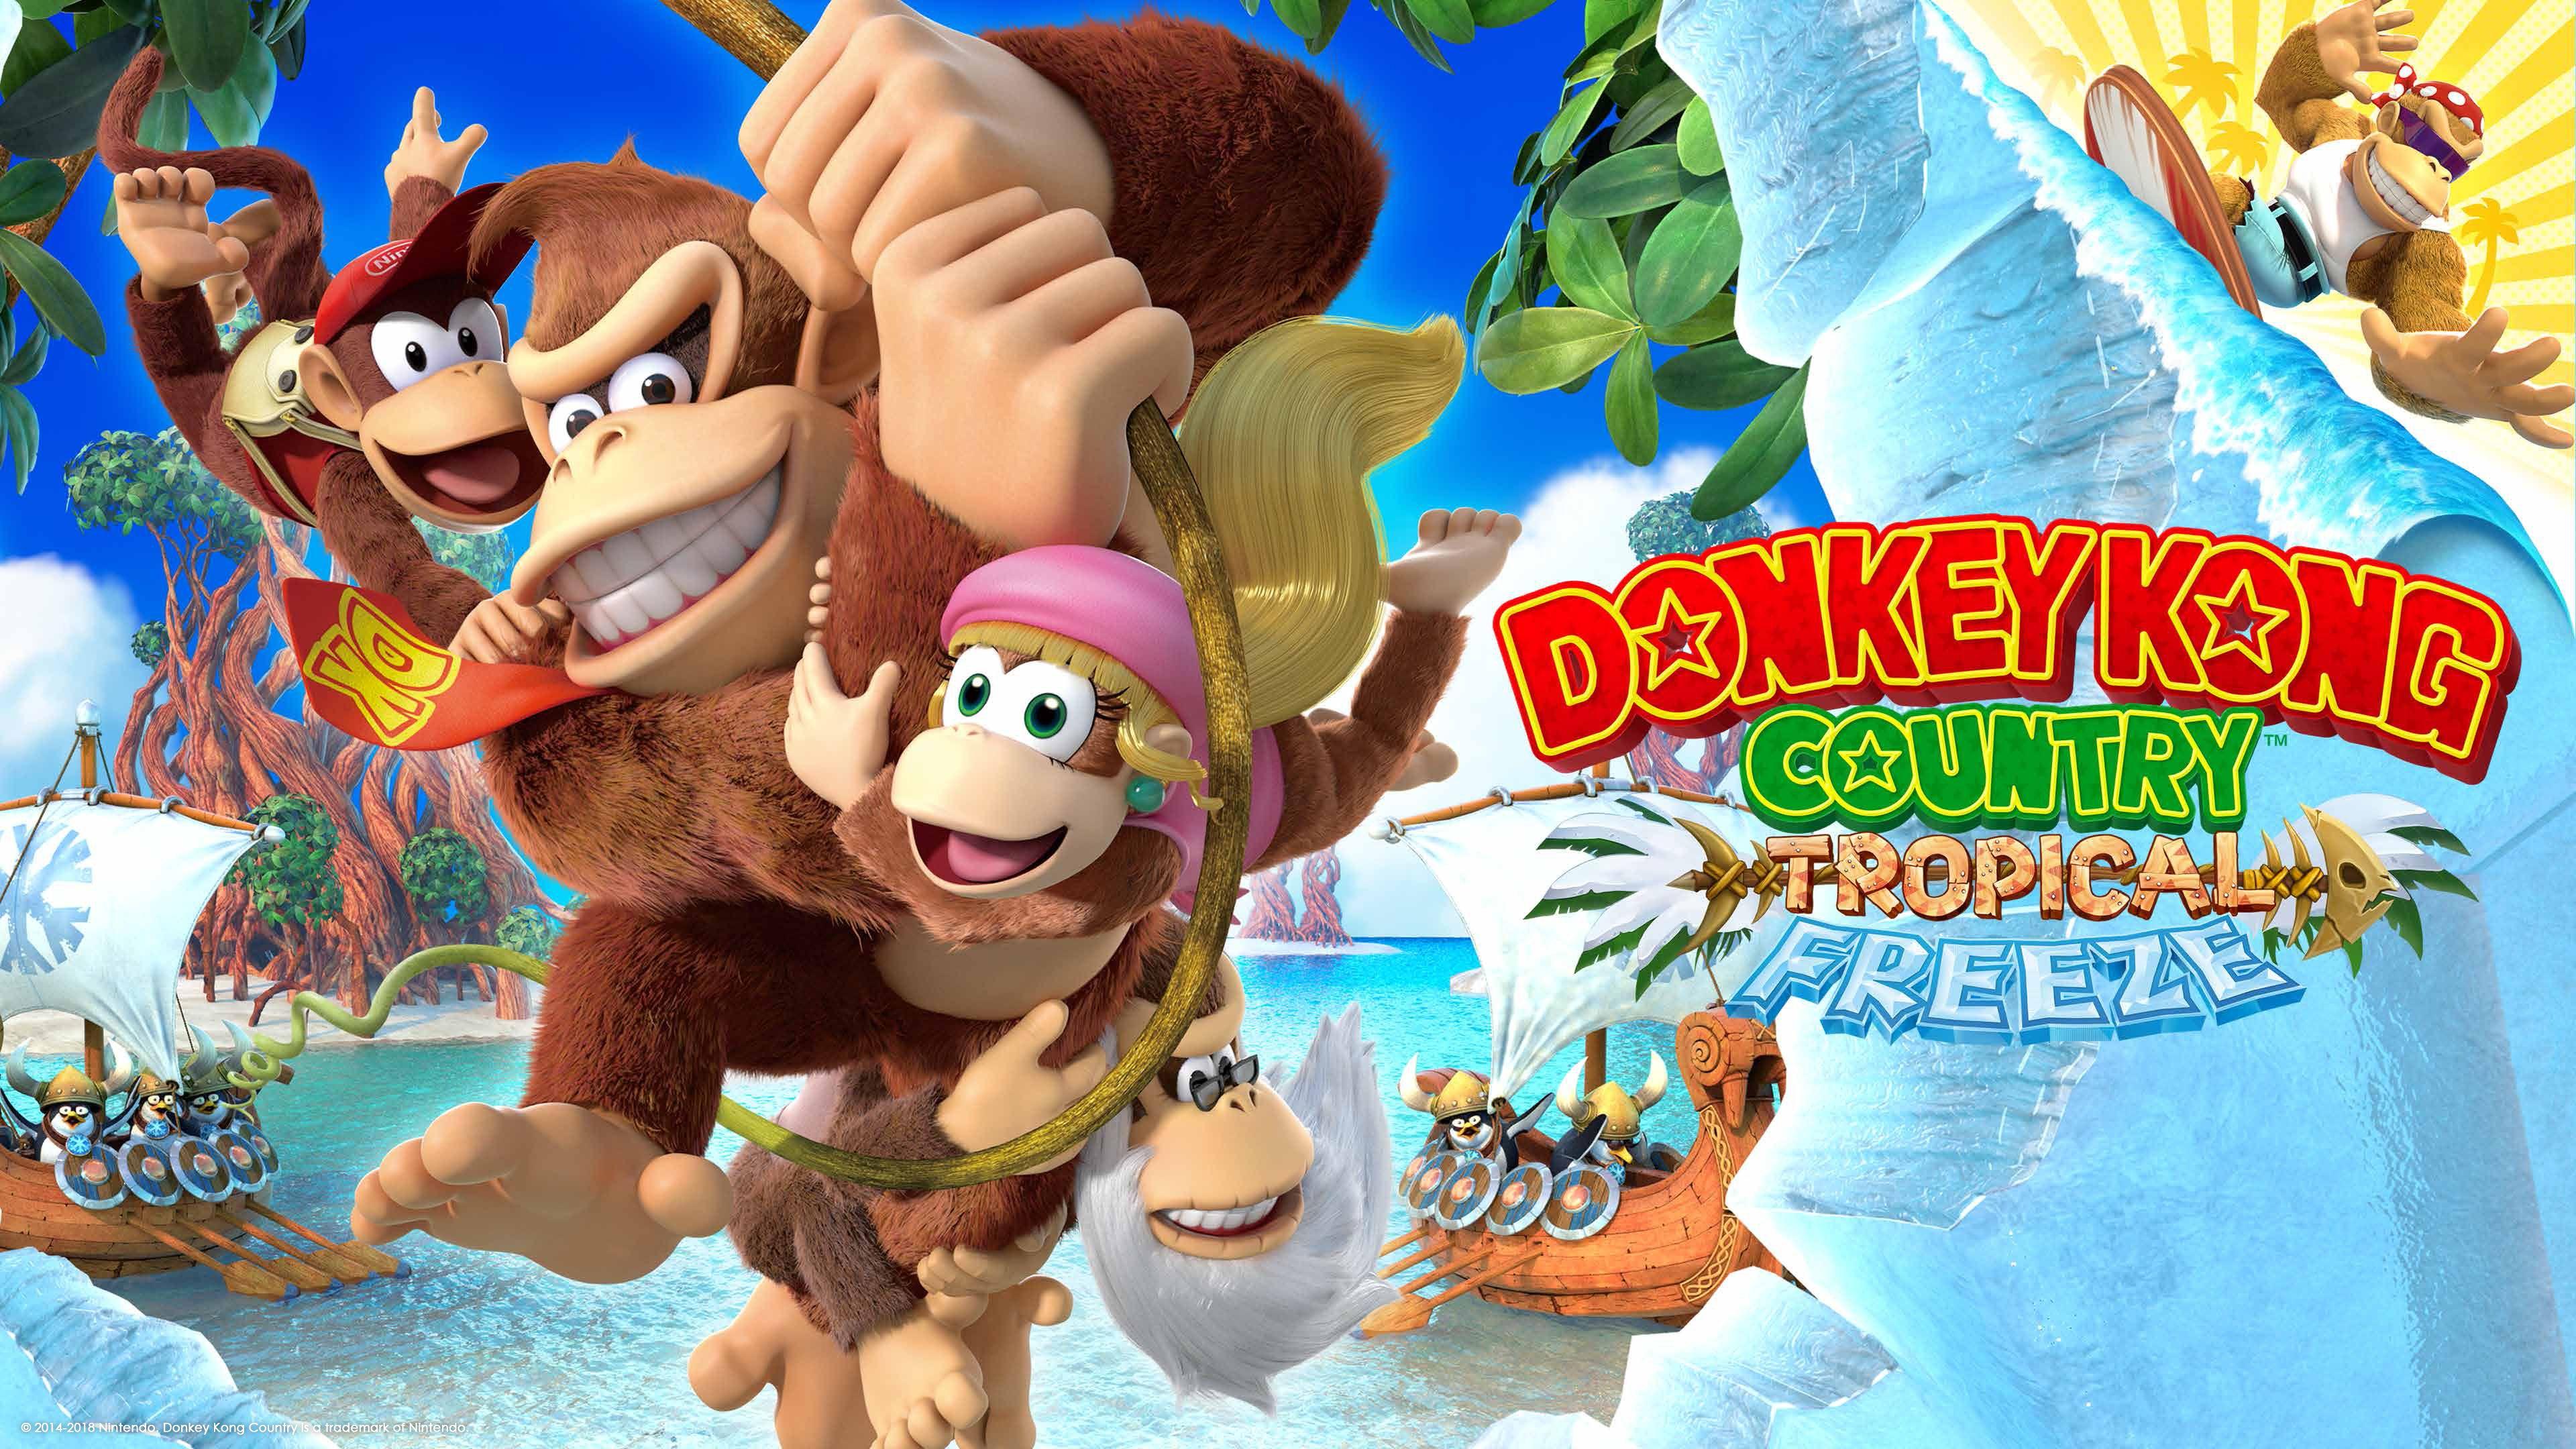 Donkey Kong Country Tropical Freeze Wallpaper 3840x2160 Donkey Kong Country Frozen Wallpaper Donkey Kong